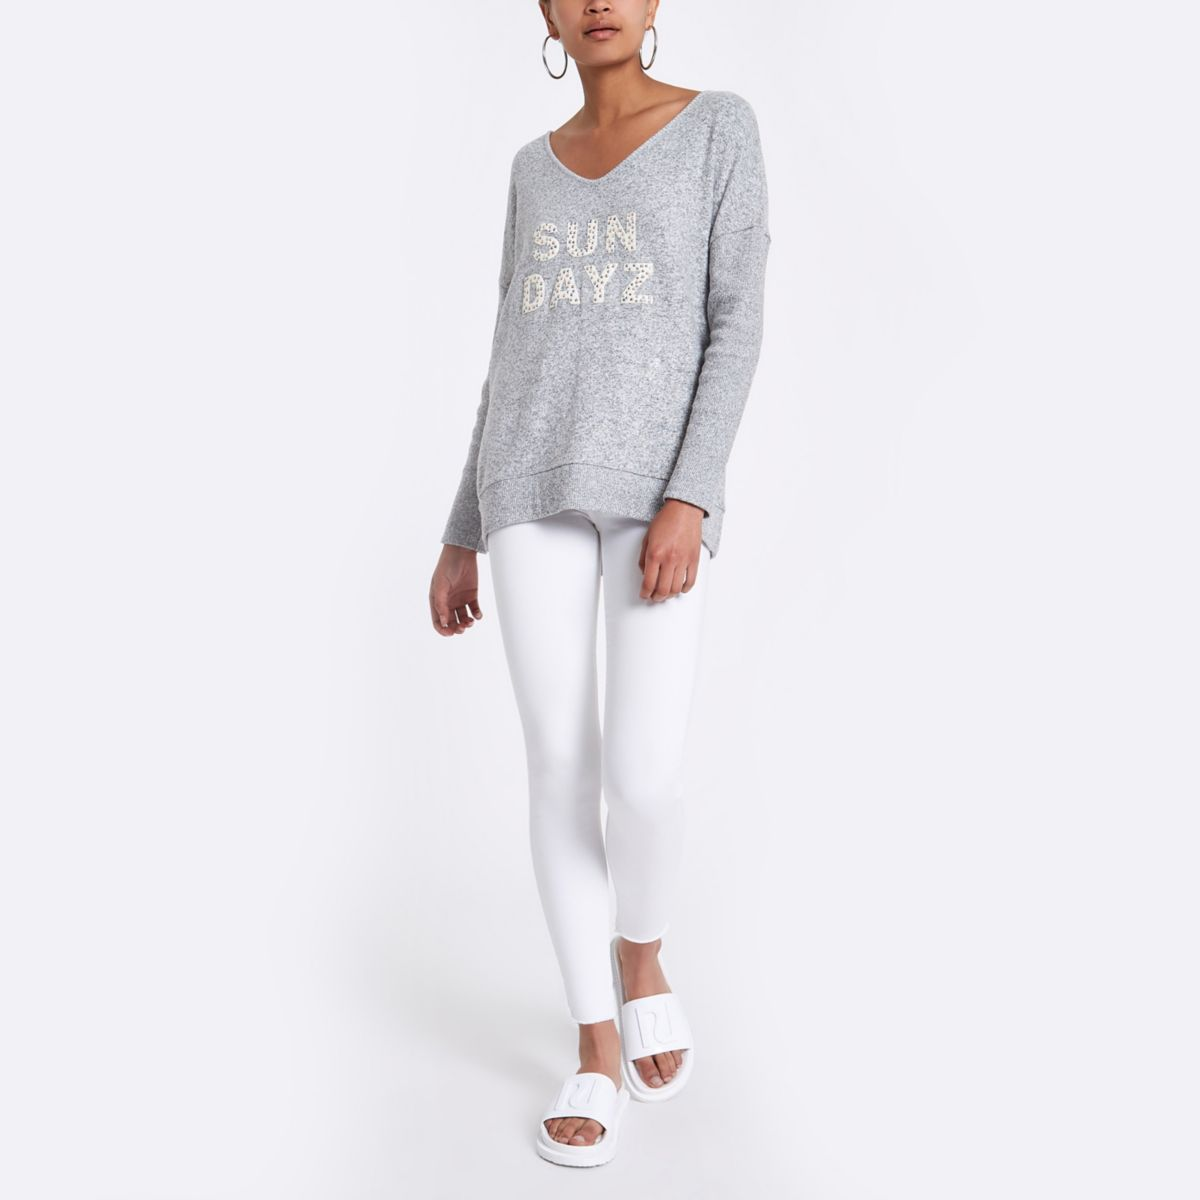 Grey 'Sun dayz' slouch sweater